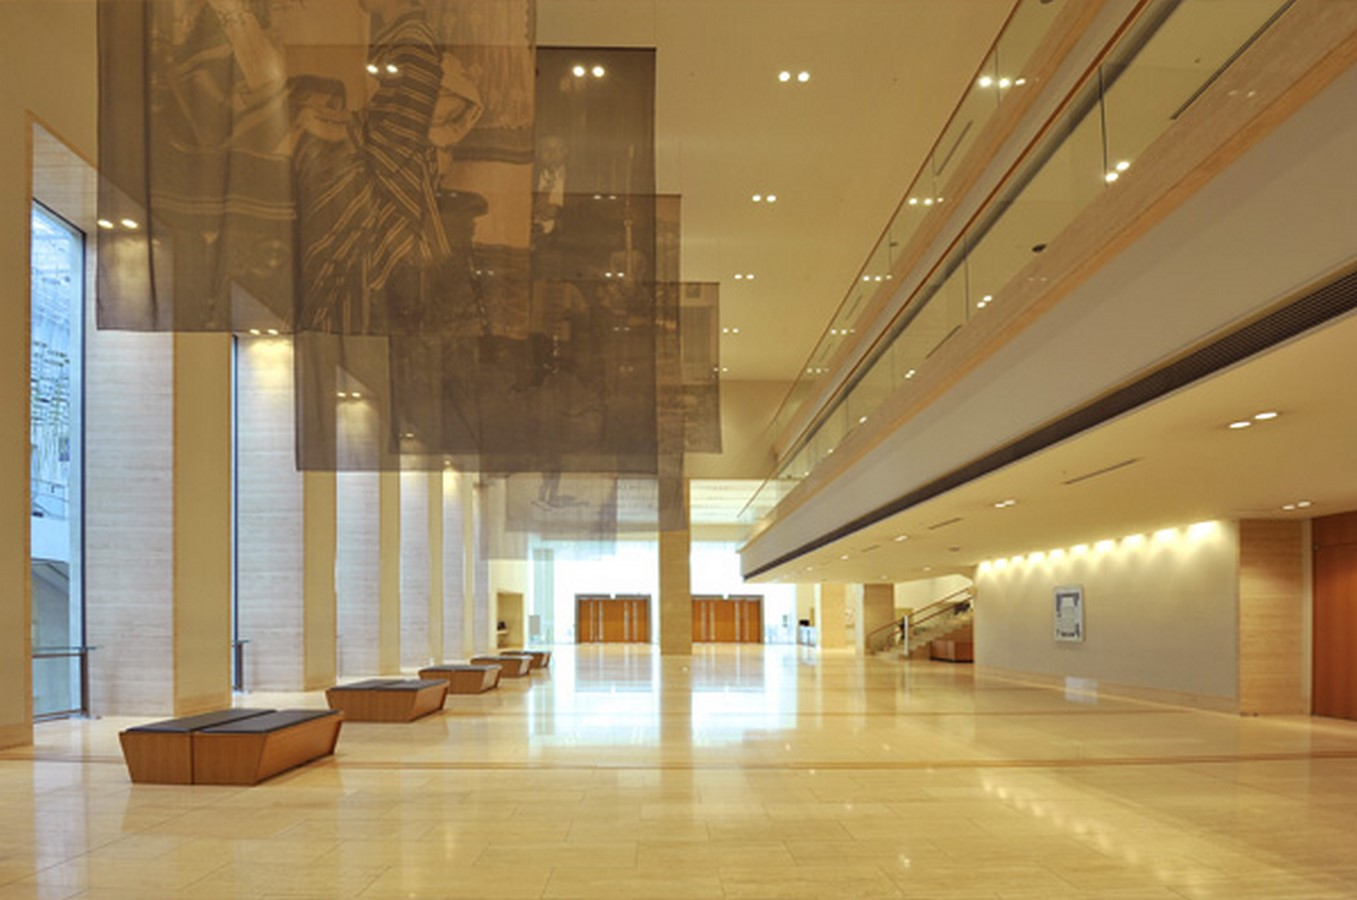 Tokyo Opera City Concert Hall by Takahiko Yanagisawa: The Perfect Pitch - Sheet3